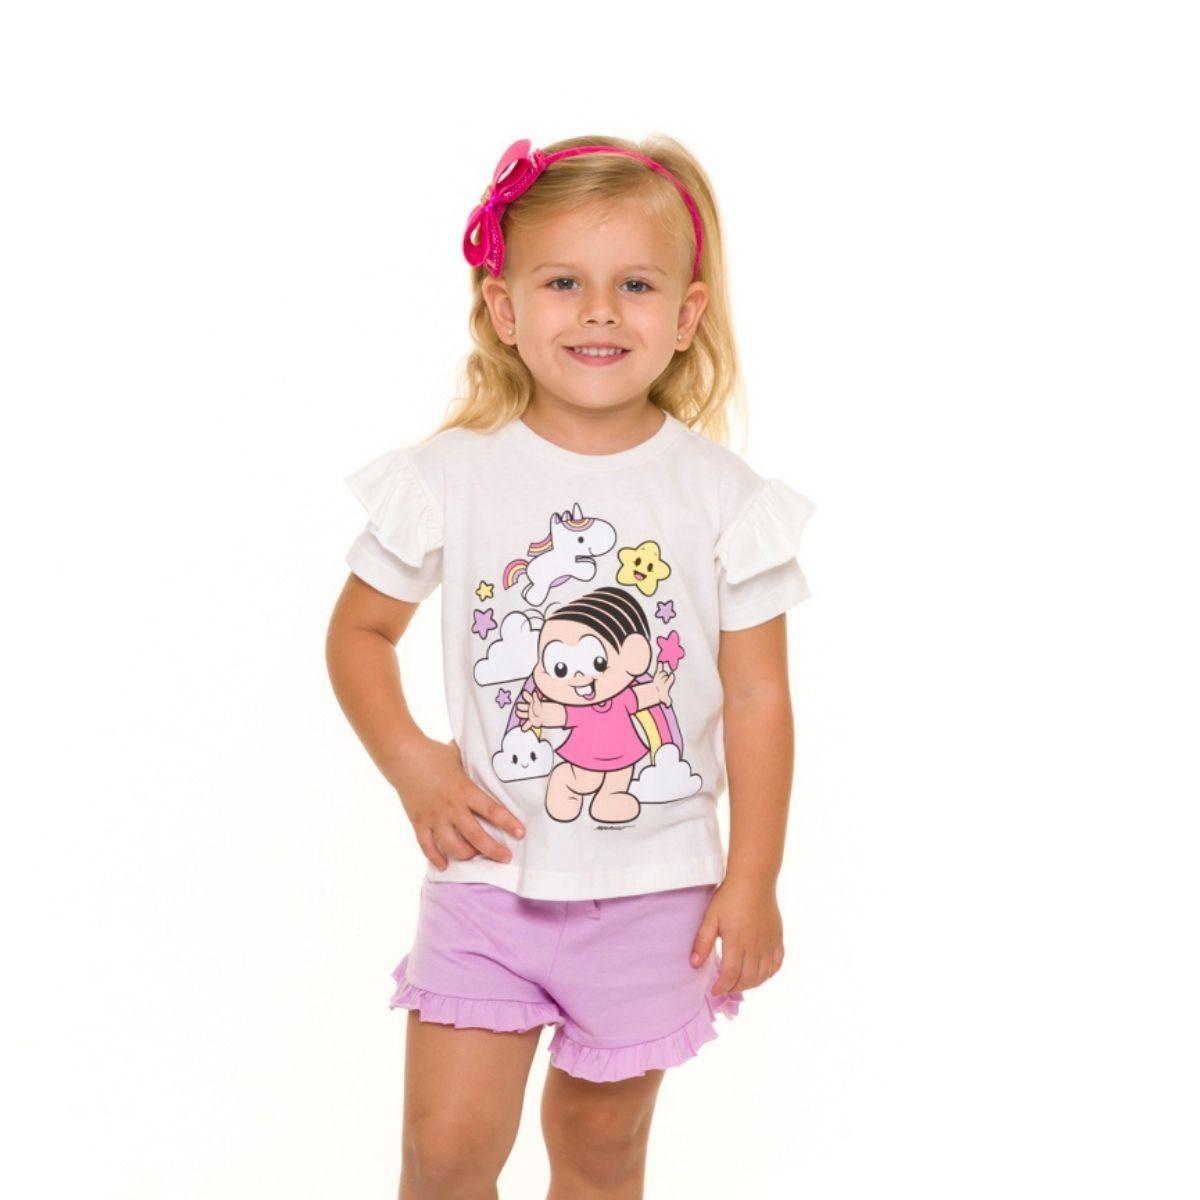 Pijama infantil menina bebe unicornio turma da monica